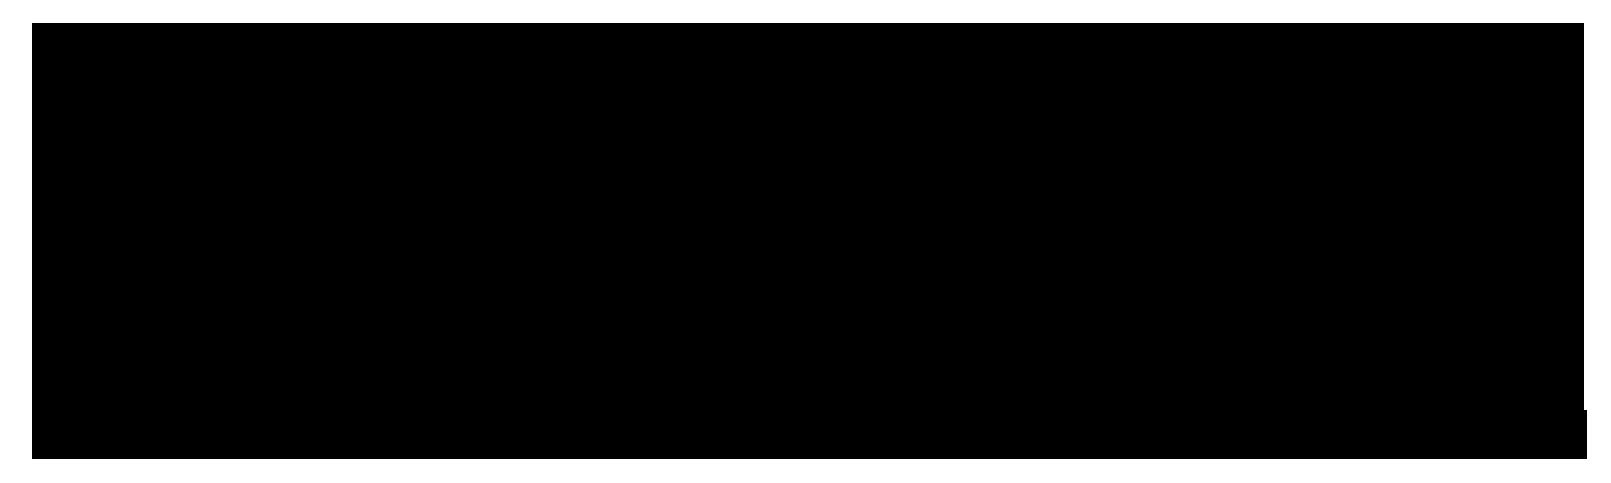 Backbone-logo_PrimaryBlue copy.png